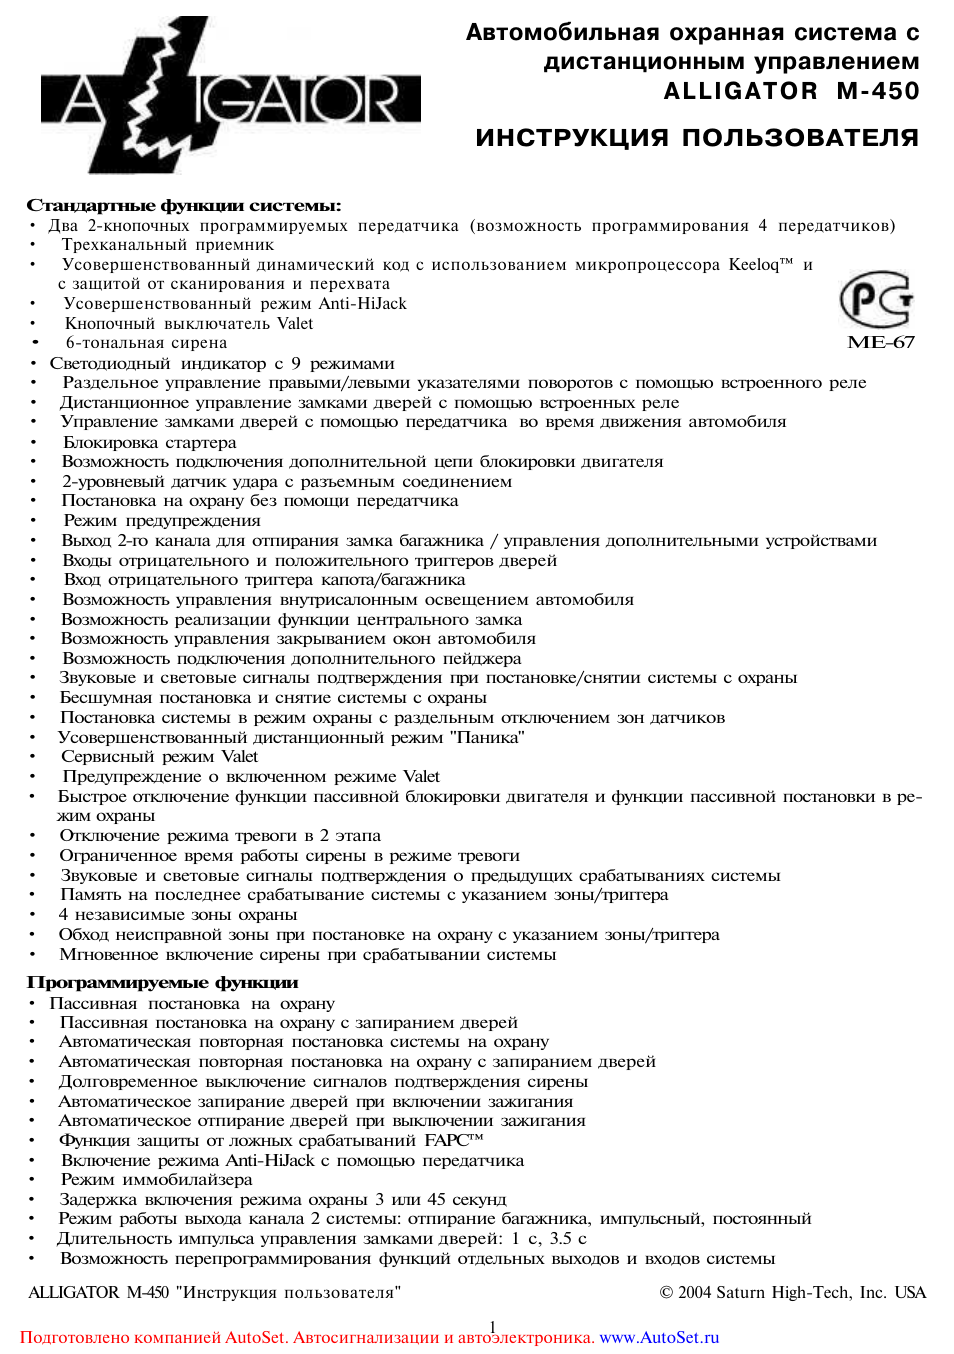 Инструкция сигнализации аллигатор m450